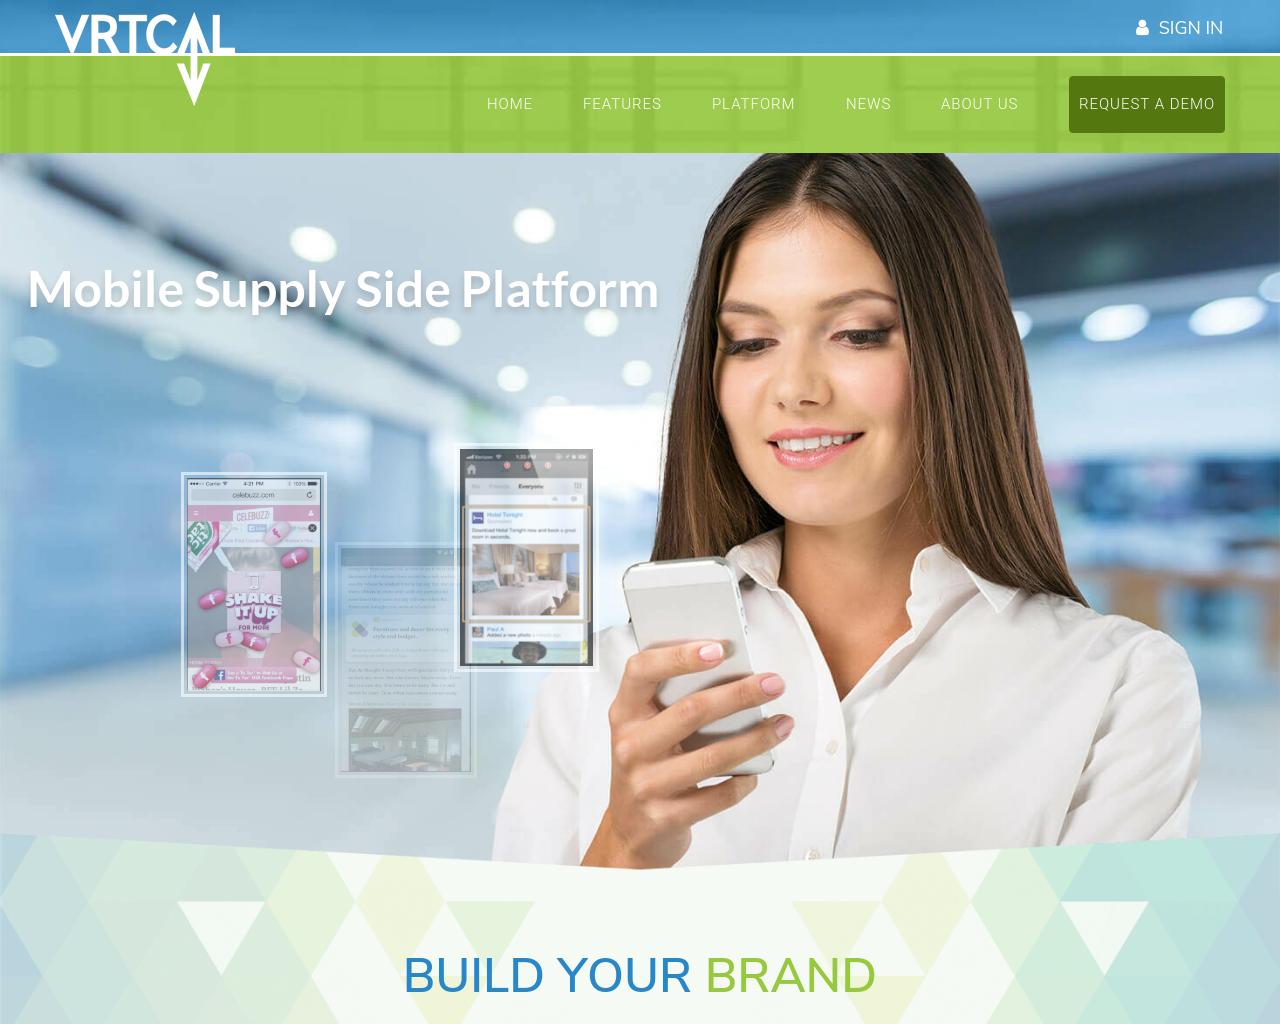 VRTCAL-Markets,-Inc.-Advertising-Reviews-Pricing